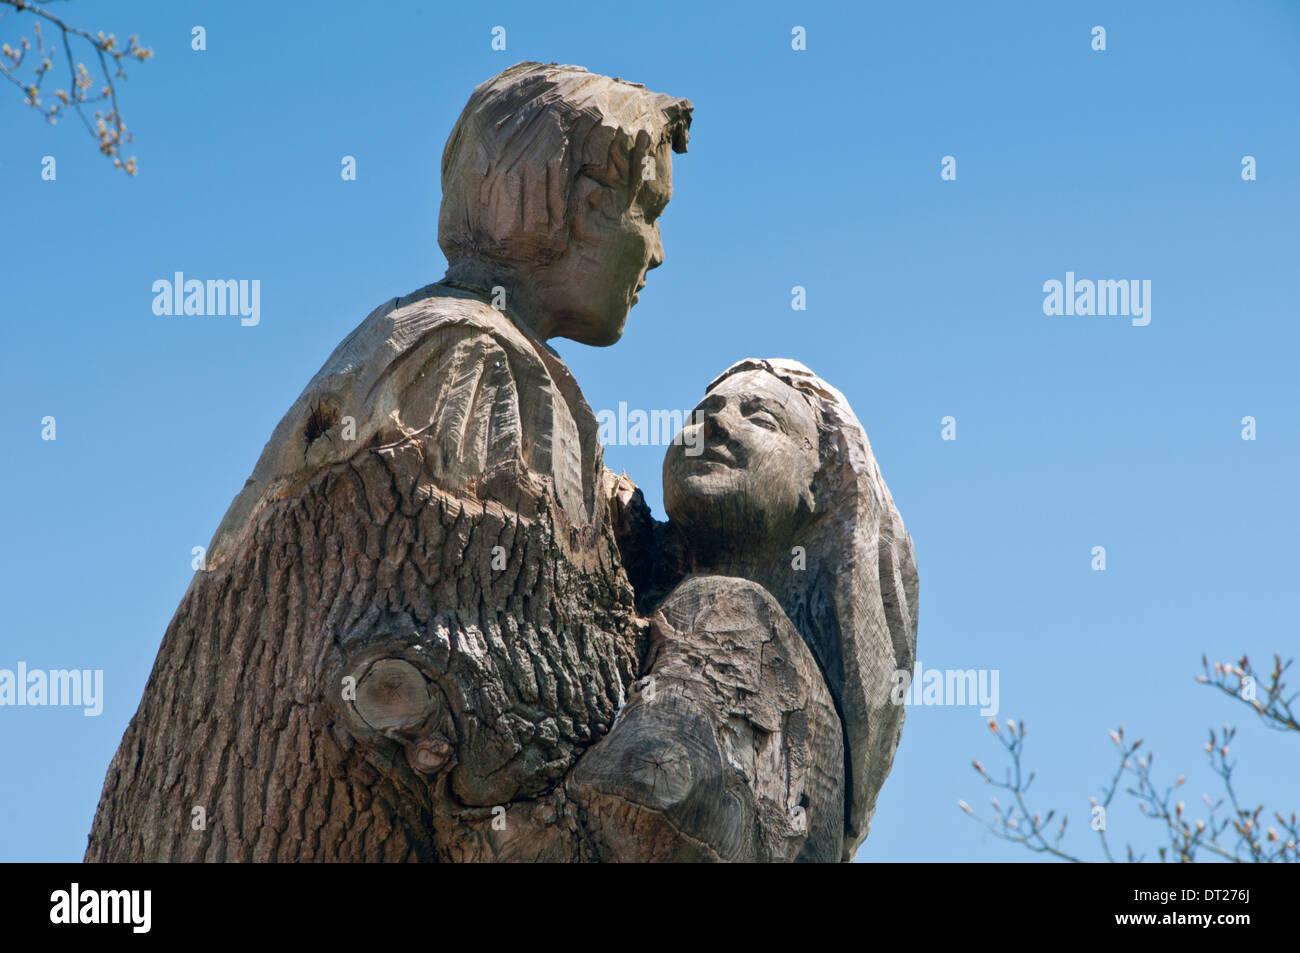 Romeo & Juliet escultura tallada en un tronco de árbol Imagen De Stock